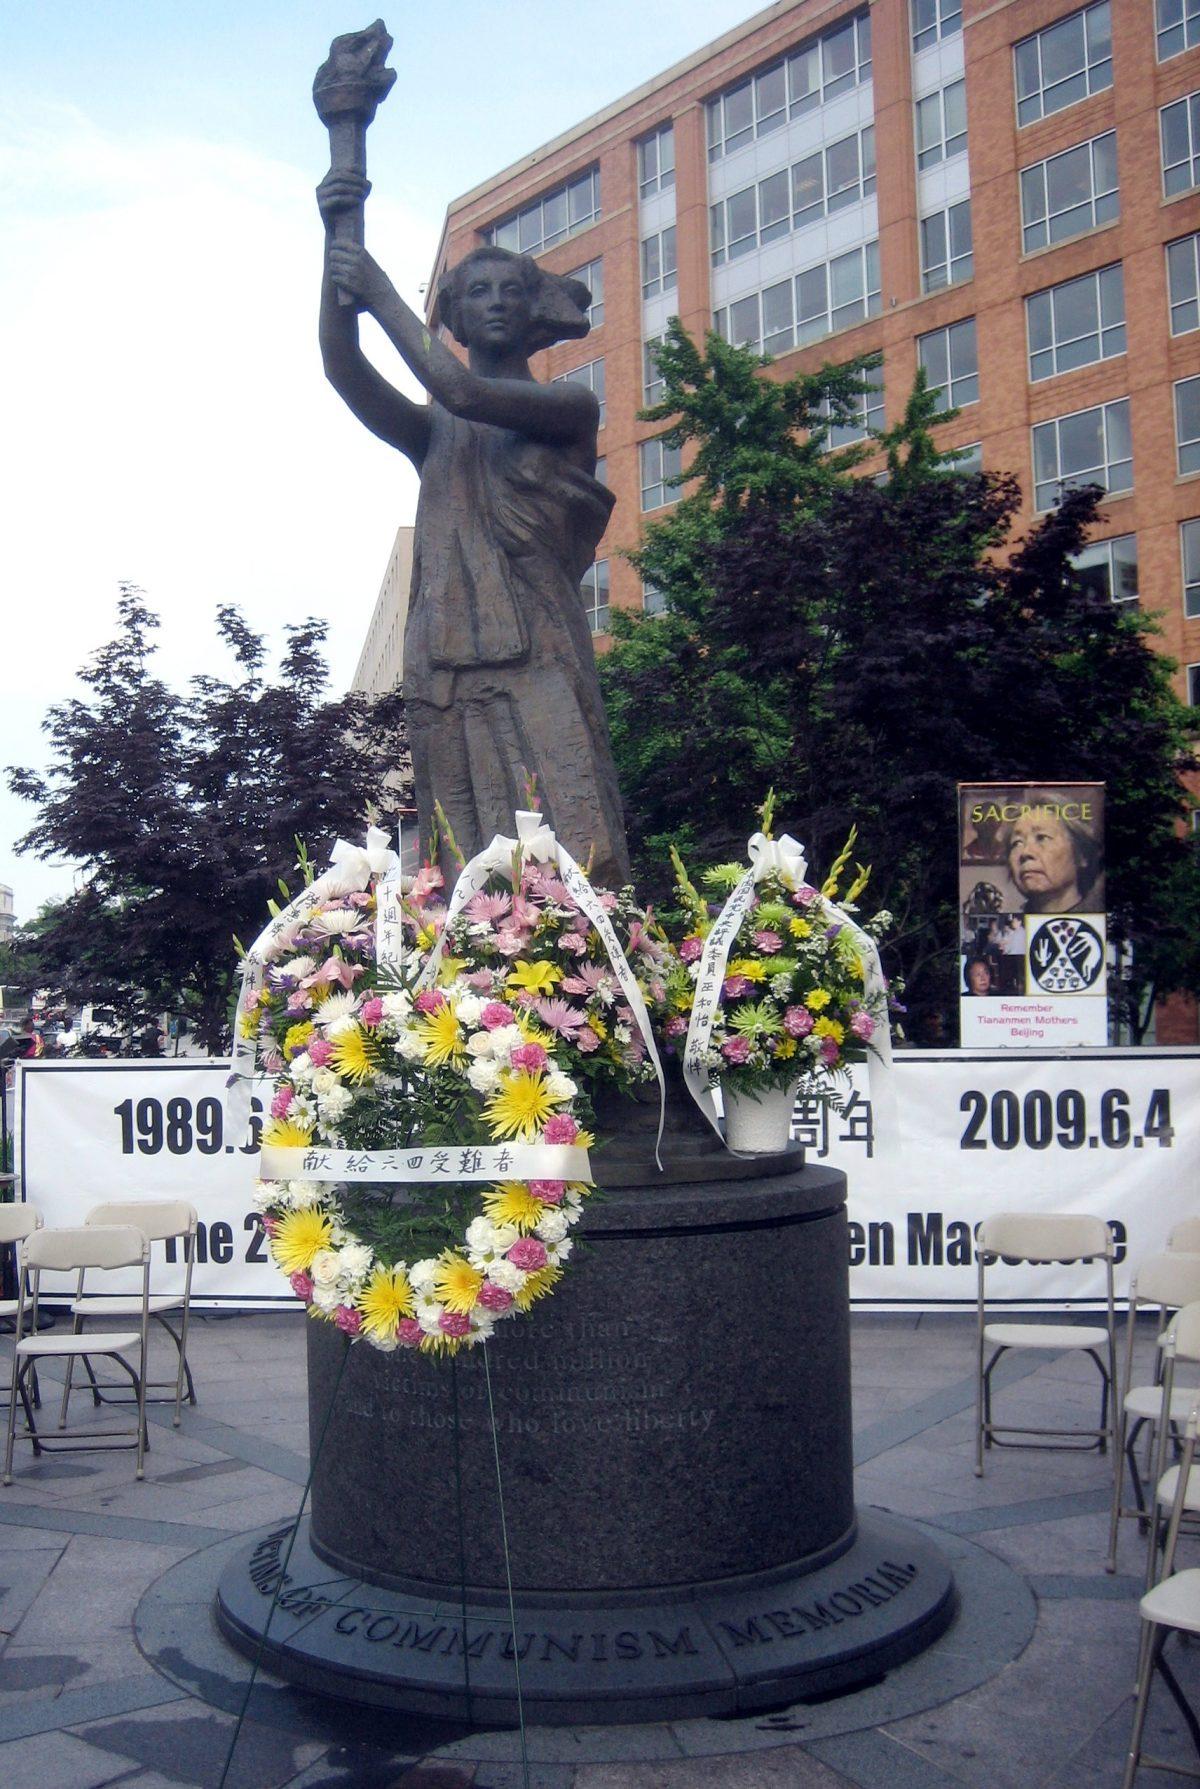 the_victims_of_communism_memorial